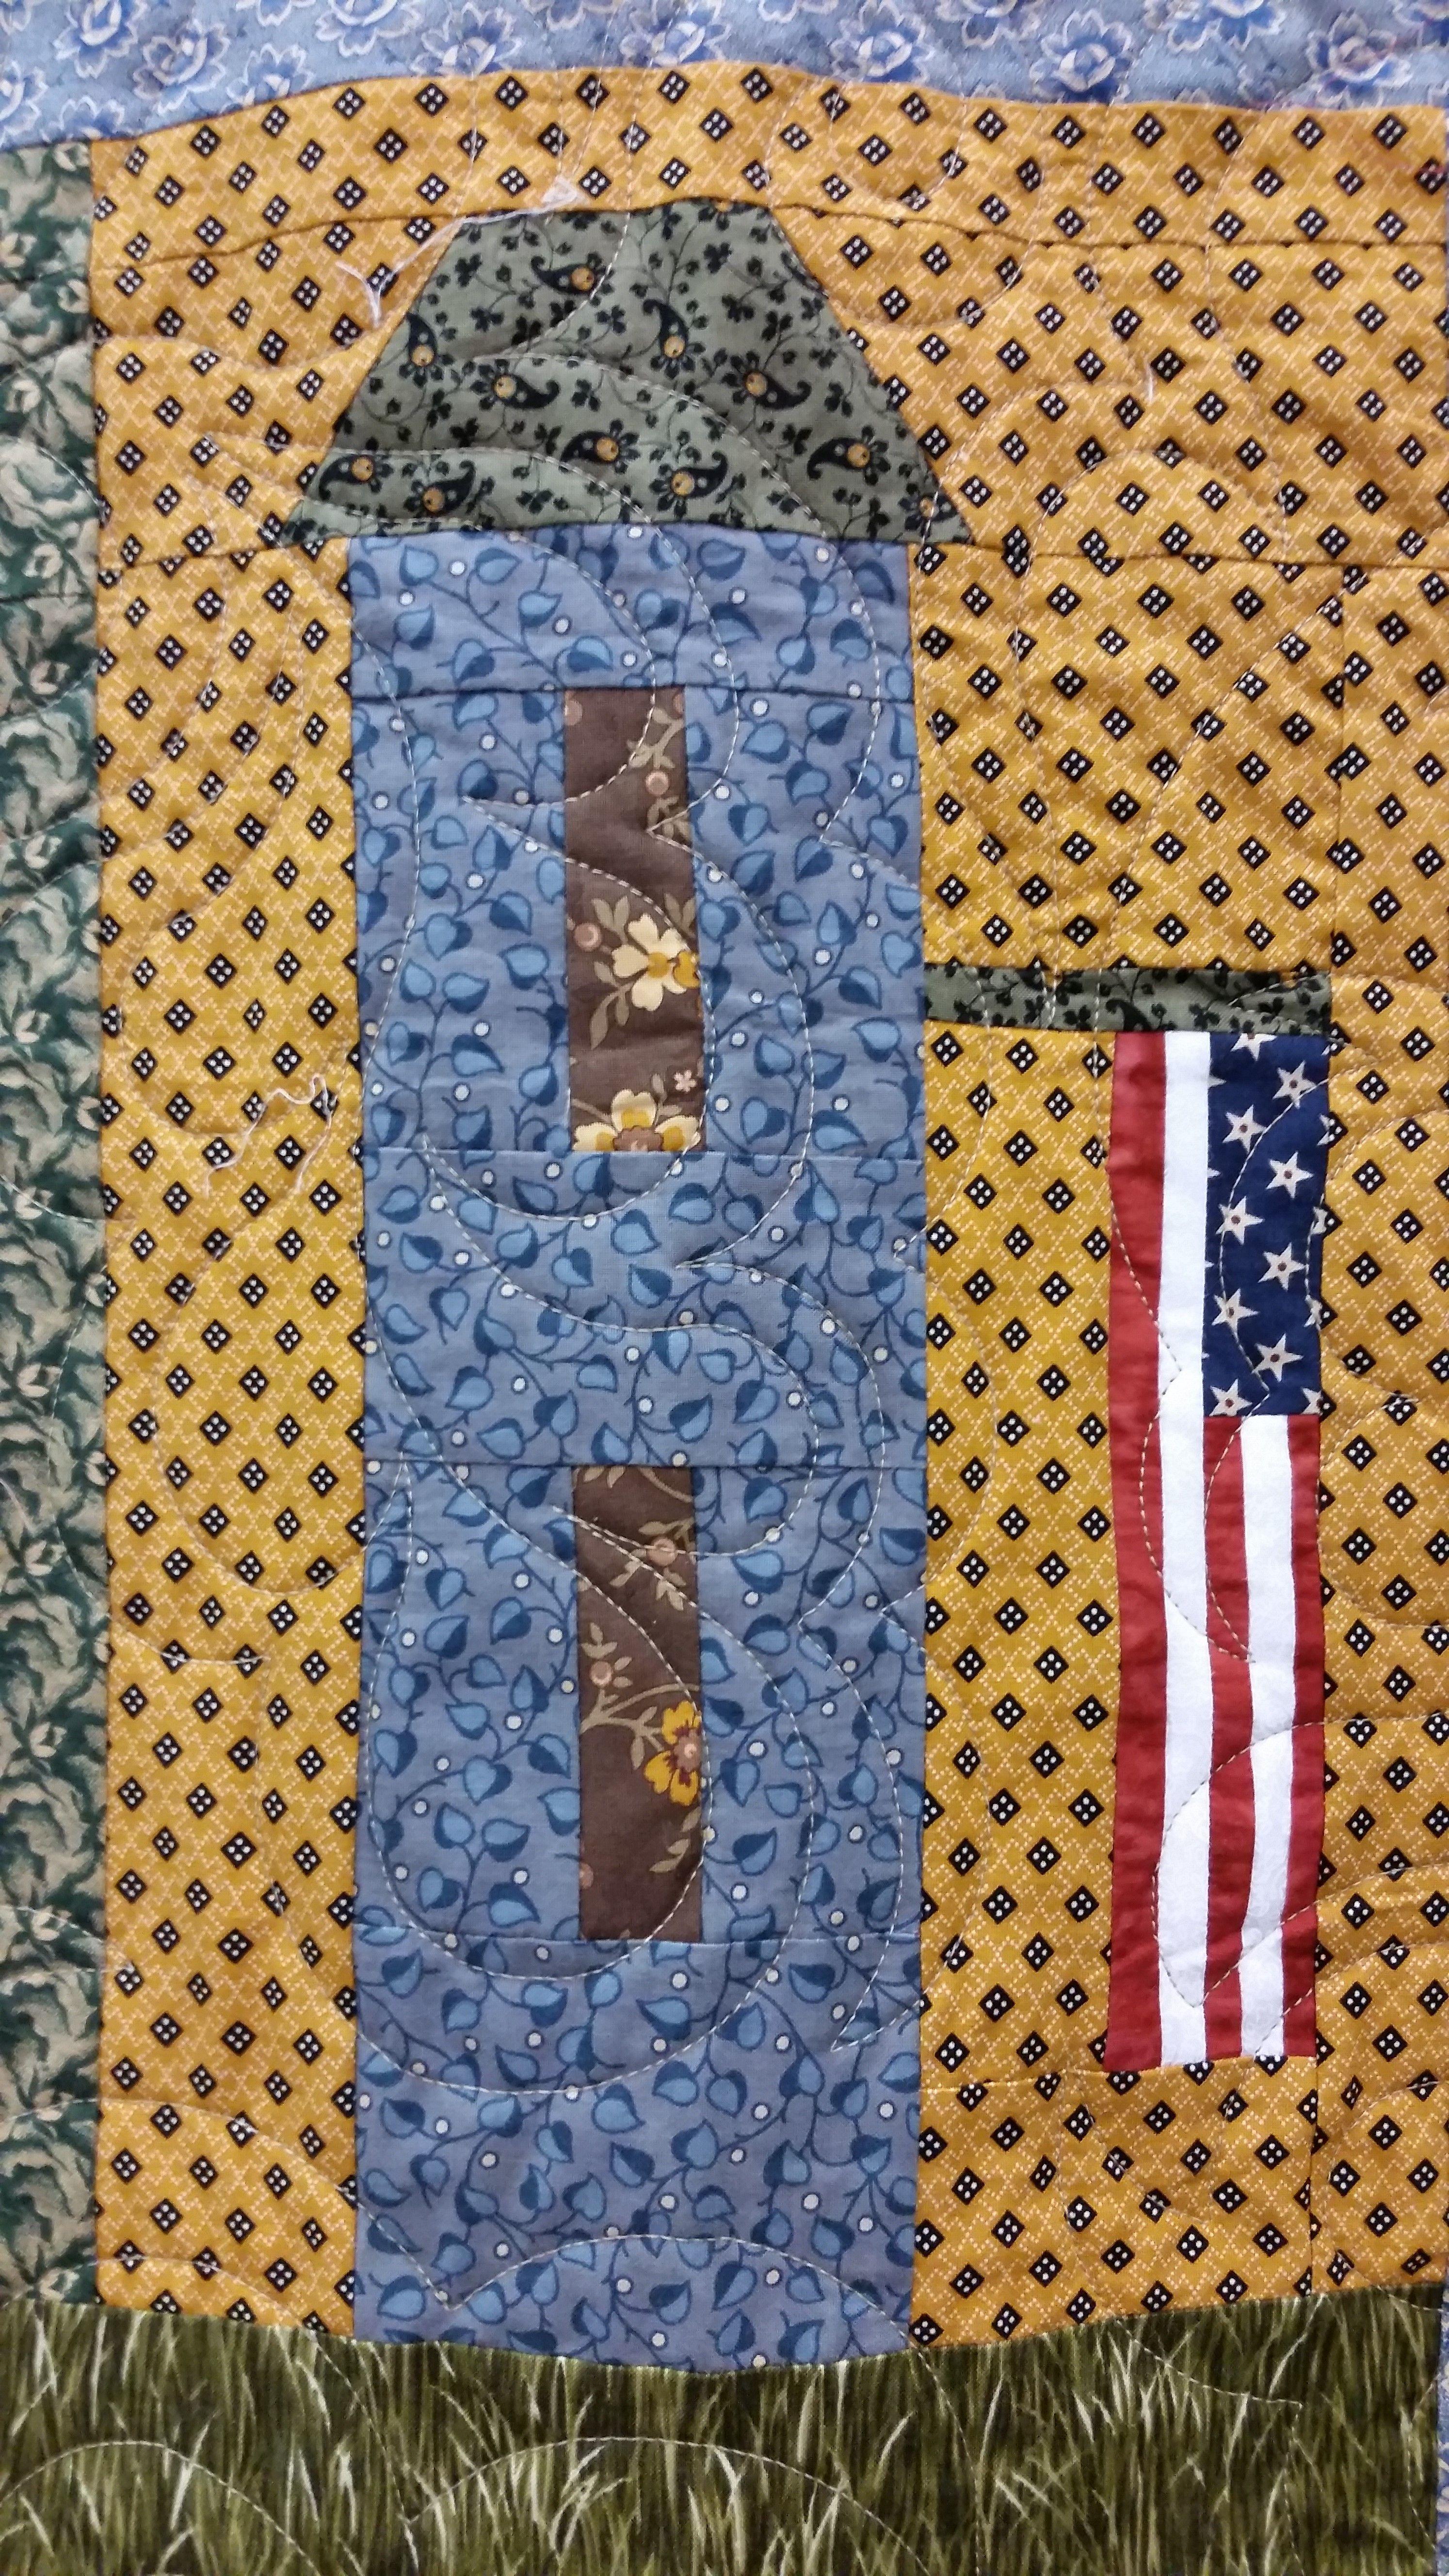 Quilts Mid-Atlantic Quilt Festival 2015 | Quilts - Buildings ... : quilt festivals 2015 - Adamdwight.com